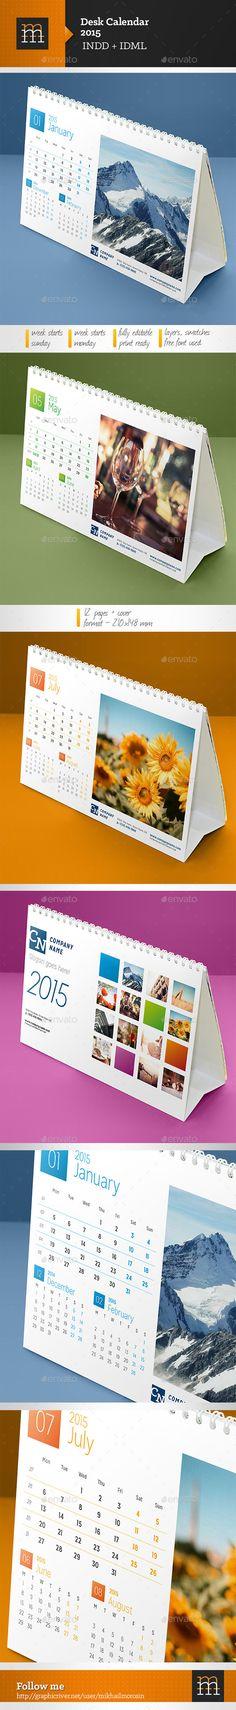 Desk Calendar 2018 template design, red cover, Set of 12 Months ...